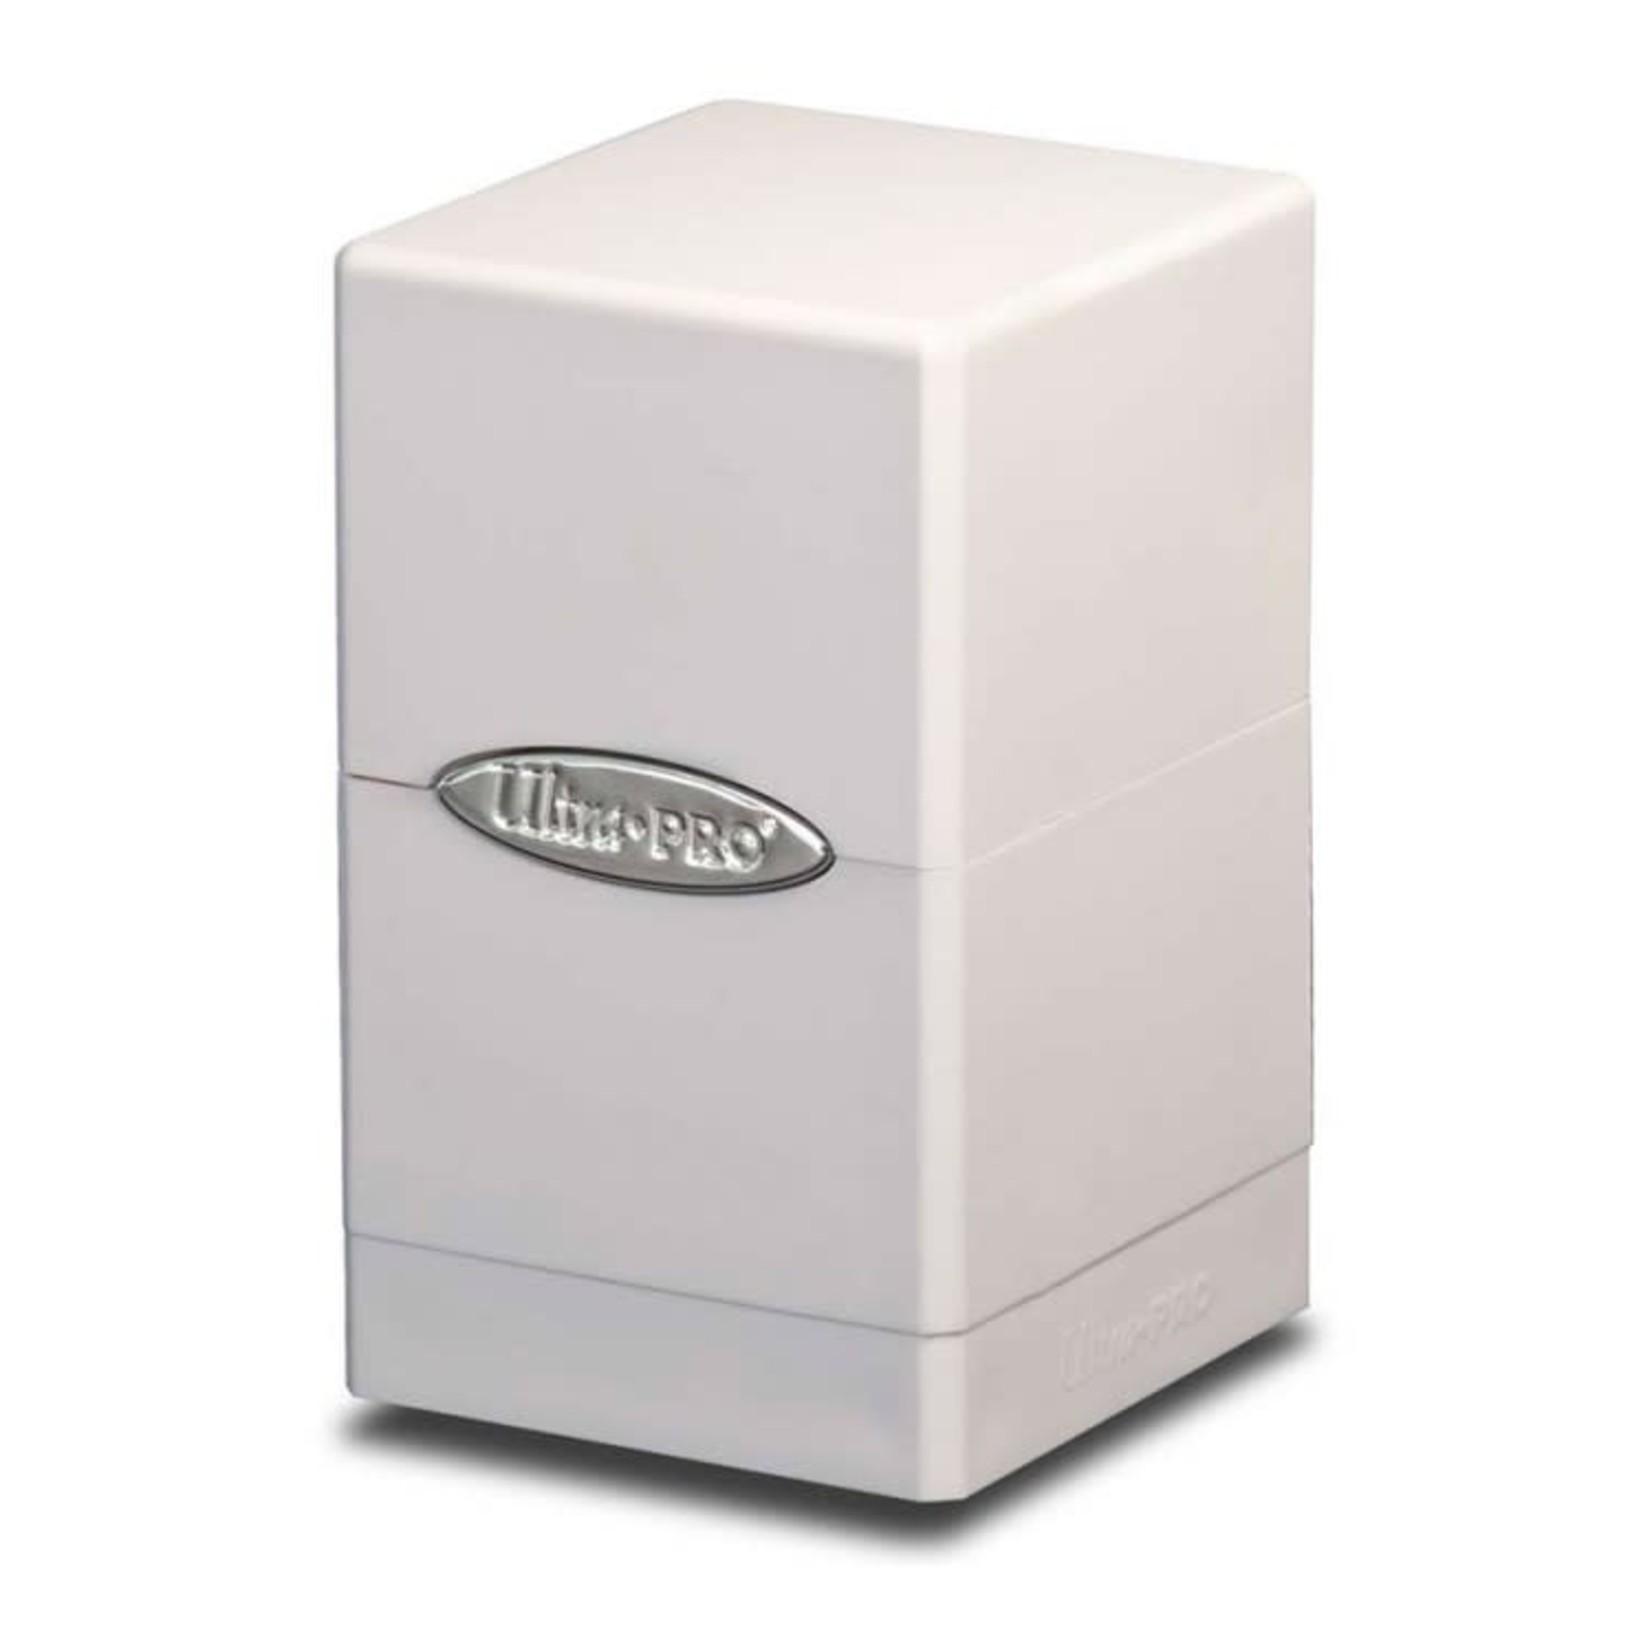 Ultra Pro Ultra-Pro Satin Tower White